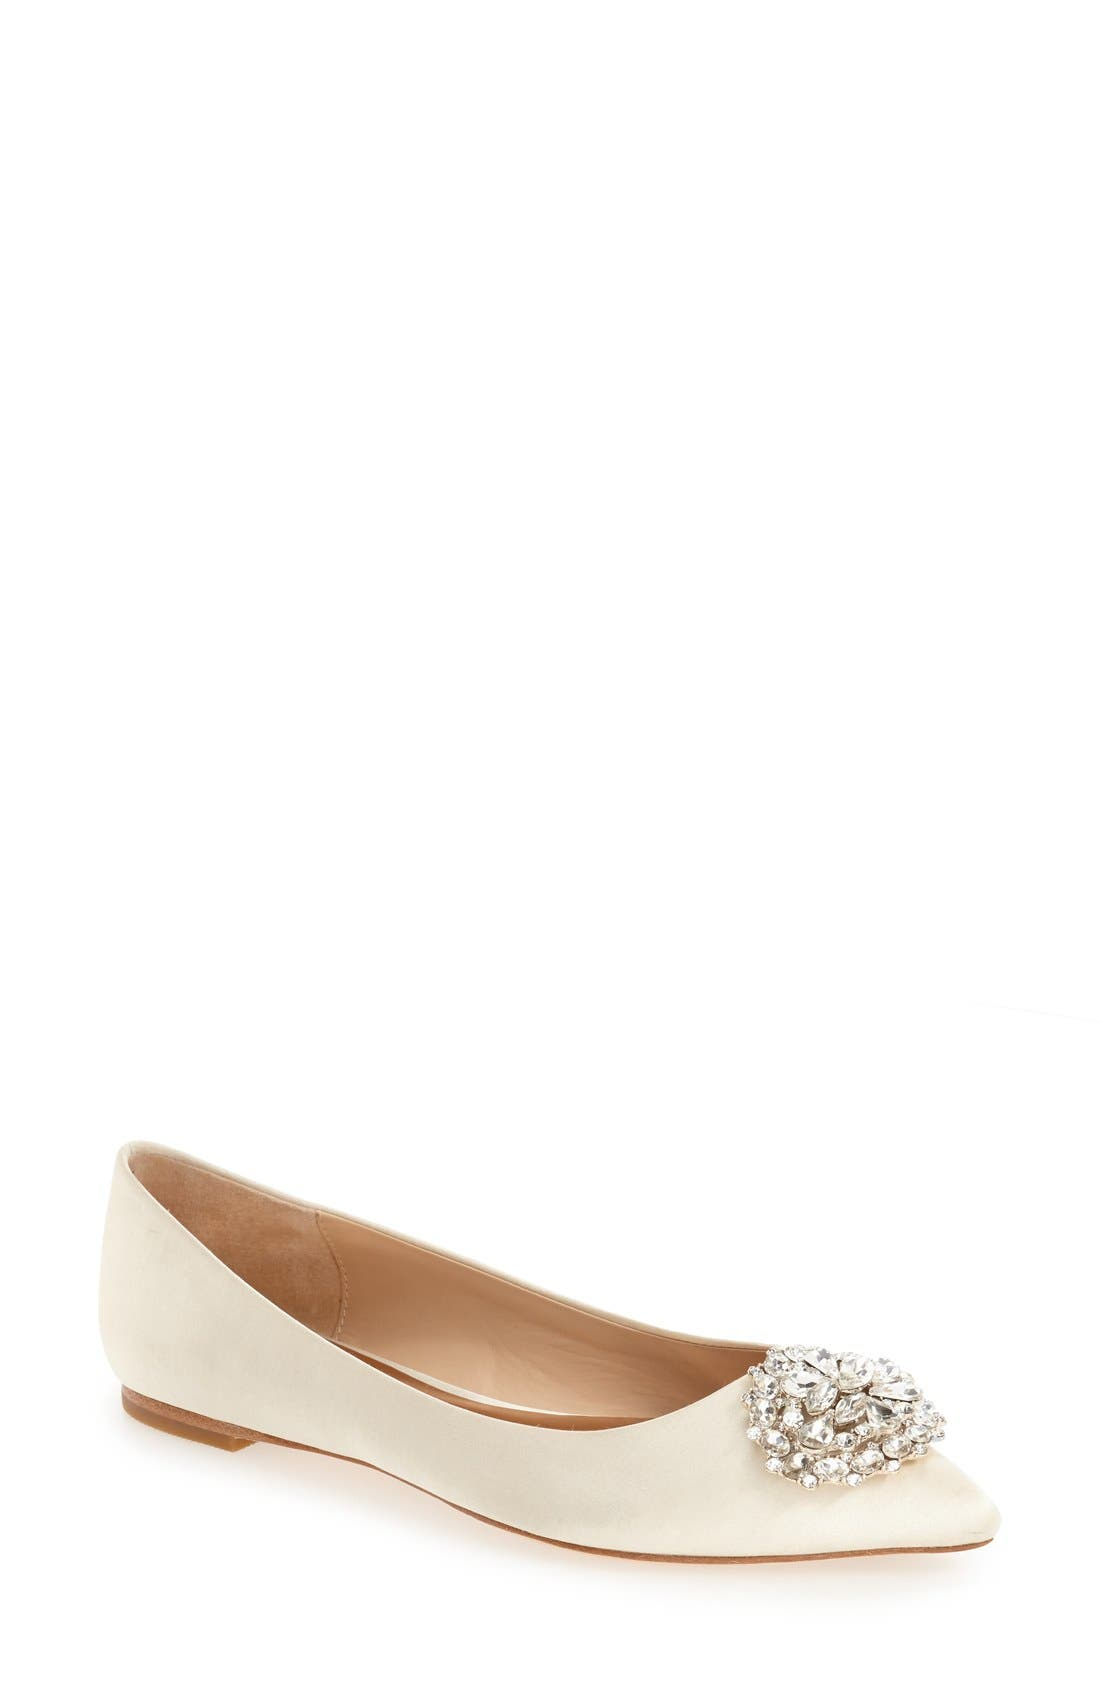 Main Image - Badgley Mischka 'Davis' Crystal Embellished Pointy Toe Flat (Women)